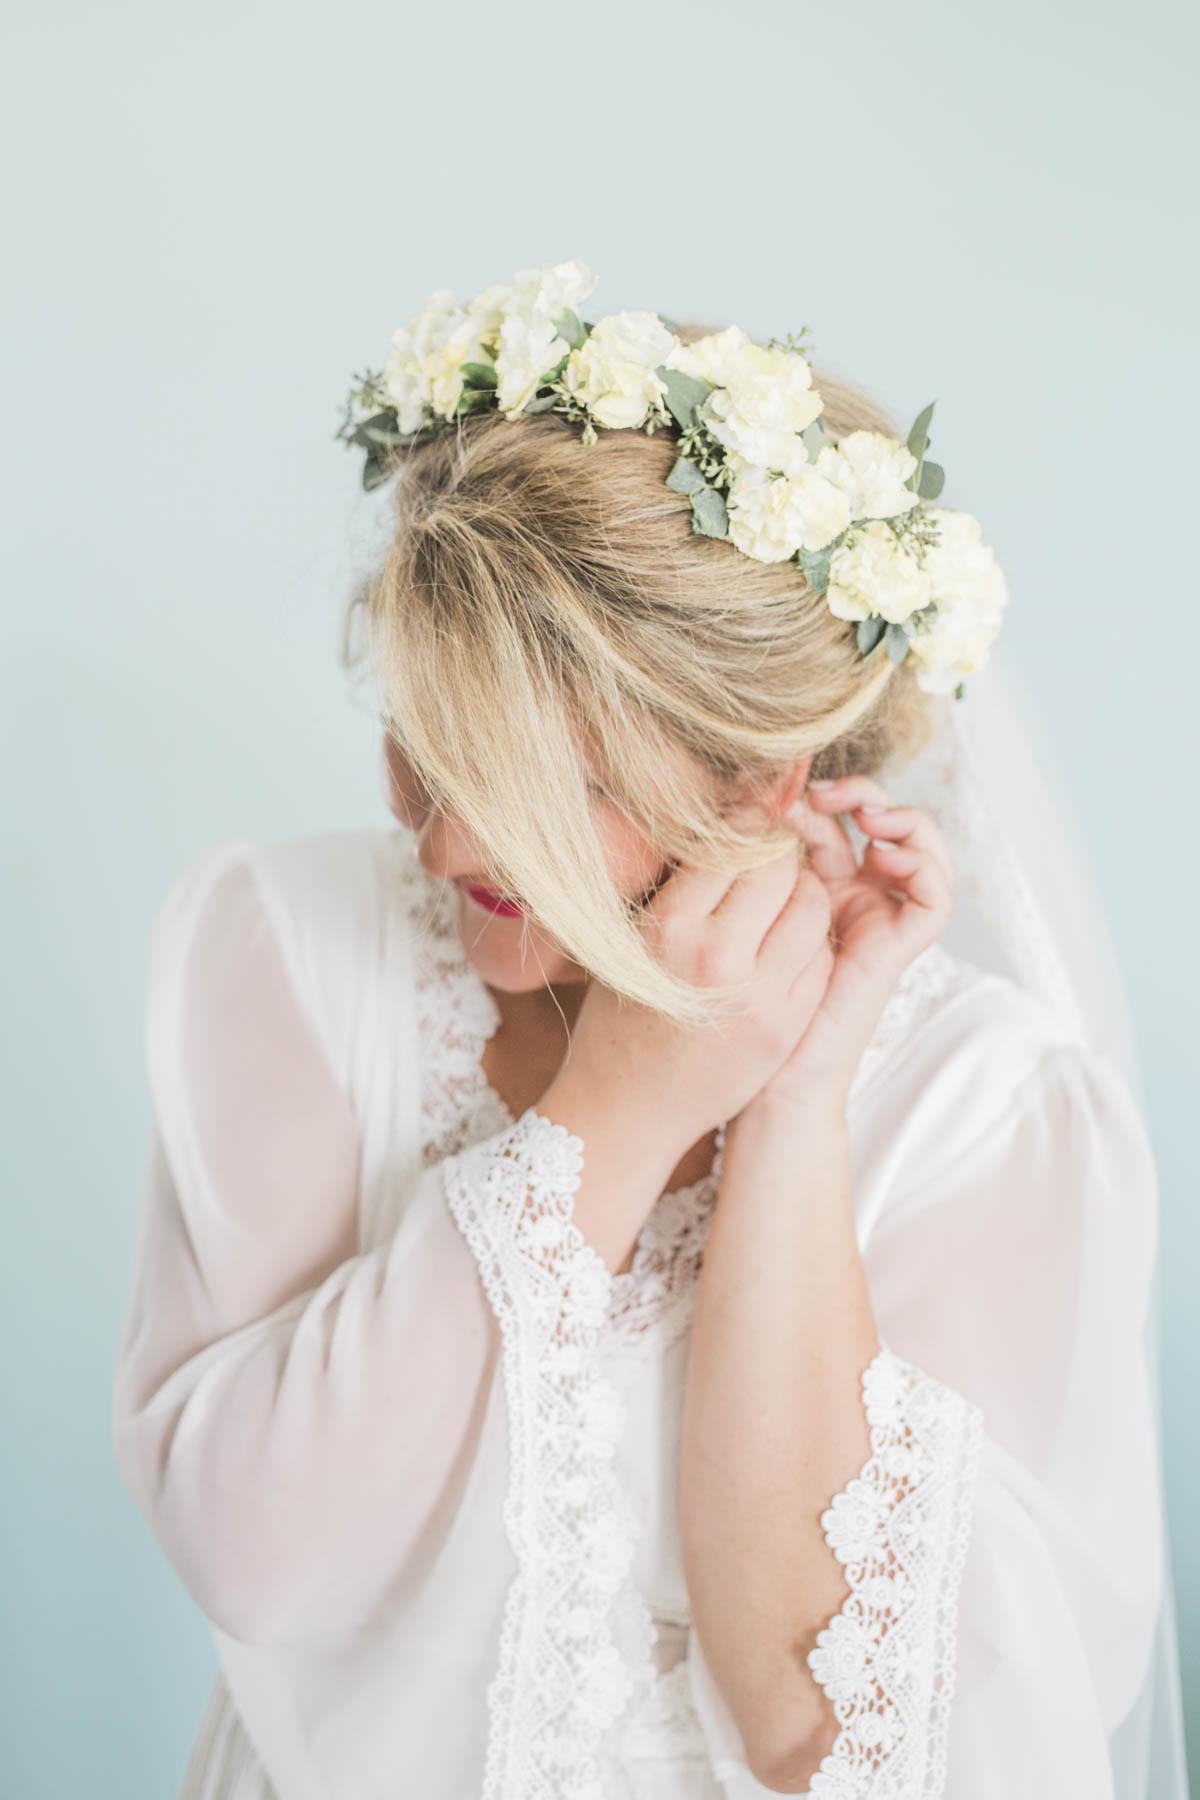 shotbychelsea_wedding_blog-18.jpg